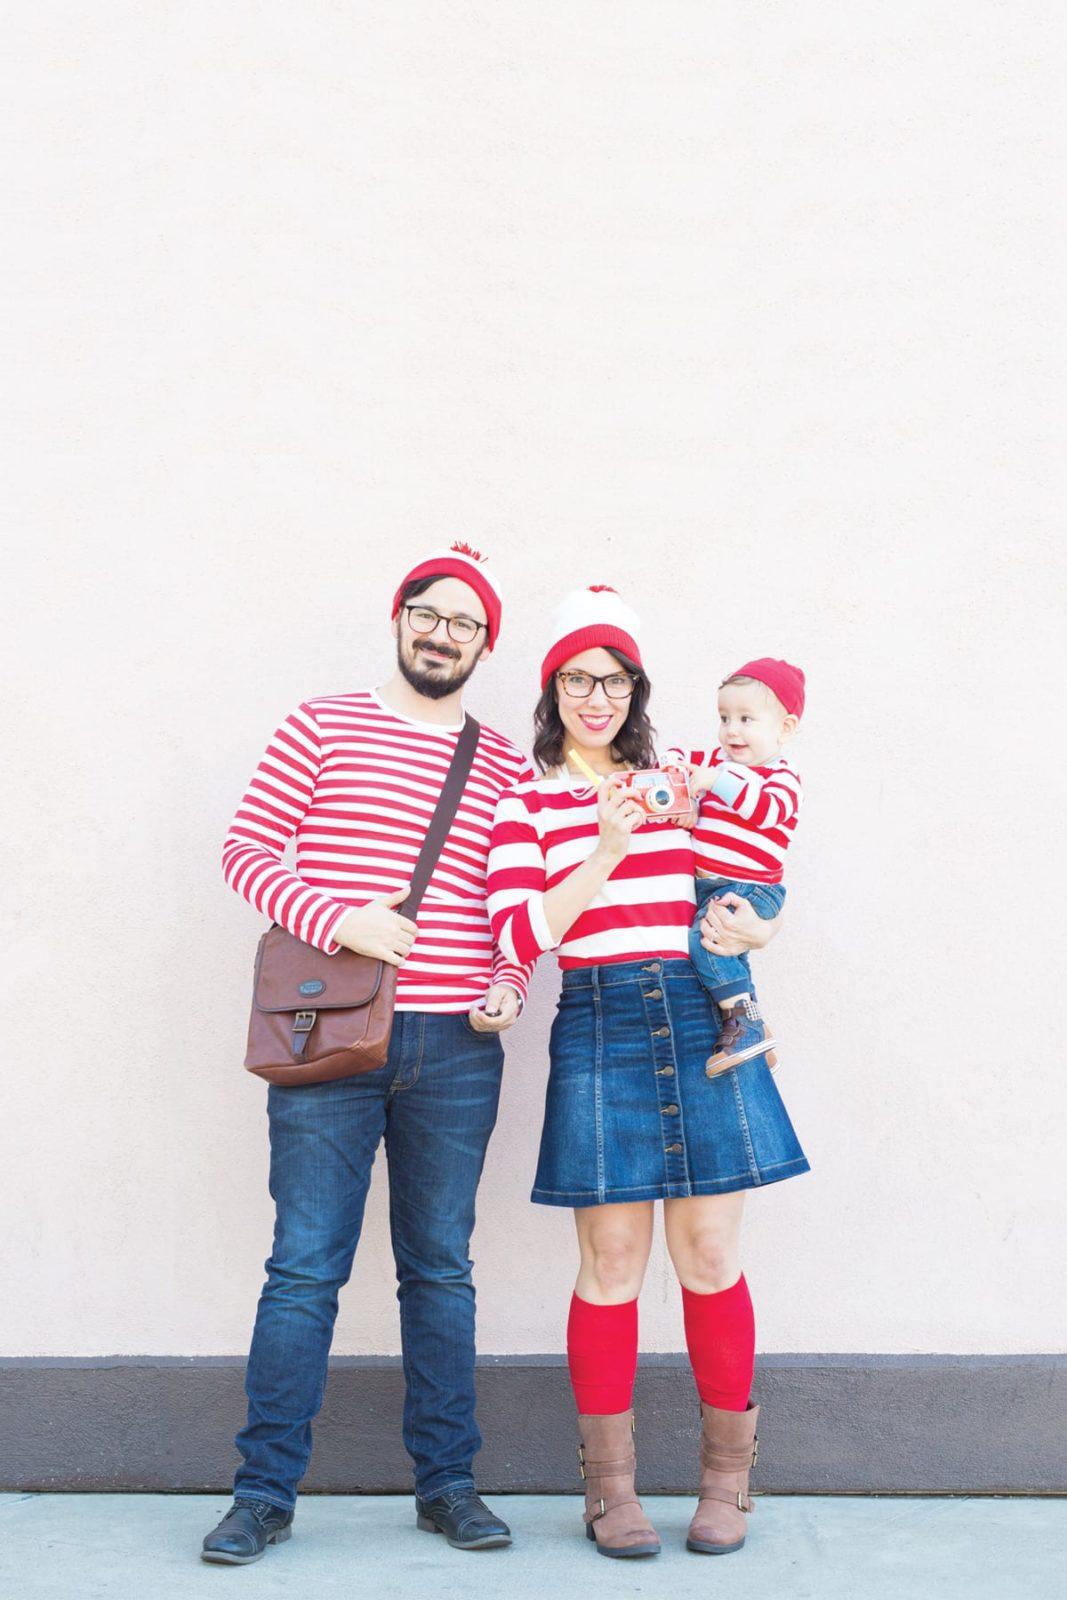 Where's Waldo family Halloween costume